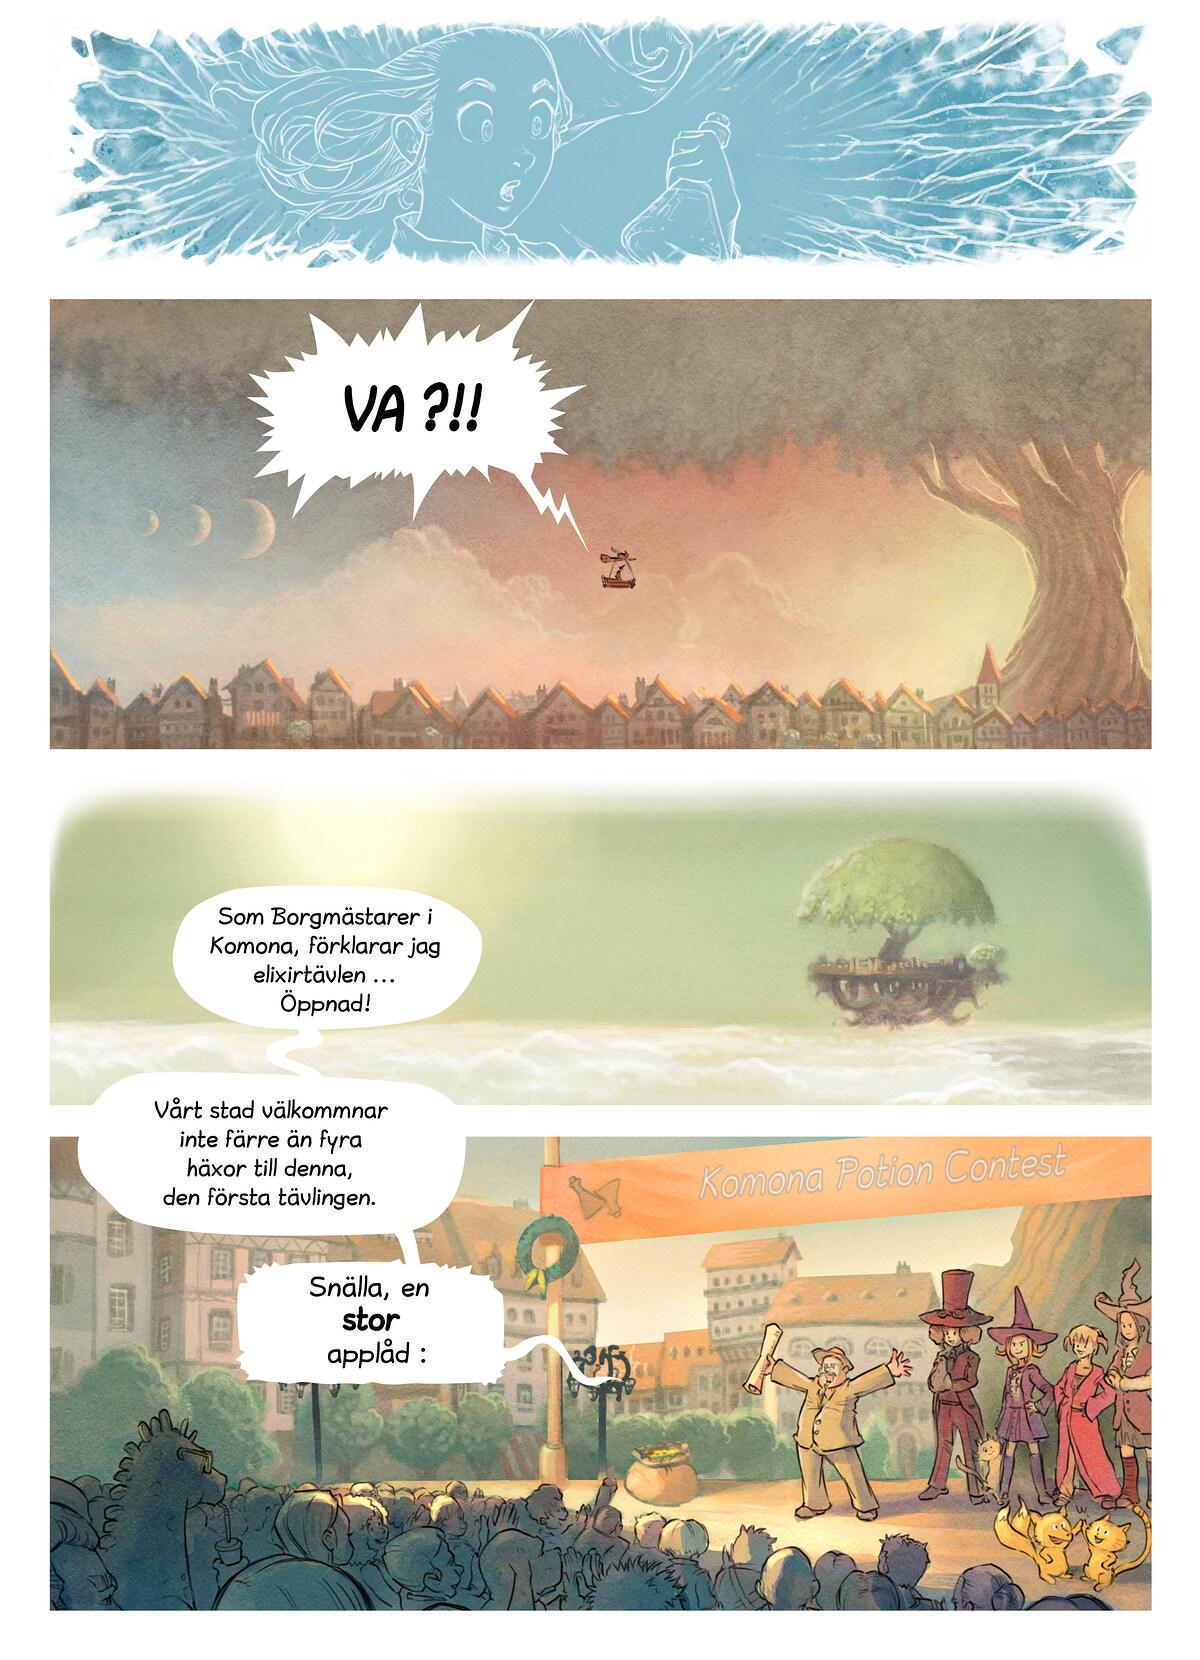 Episode 6: Elixrtävlingen, Page 3